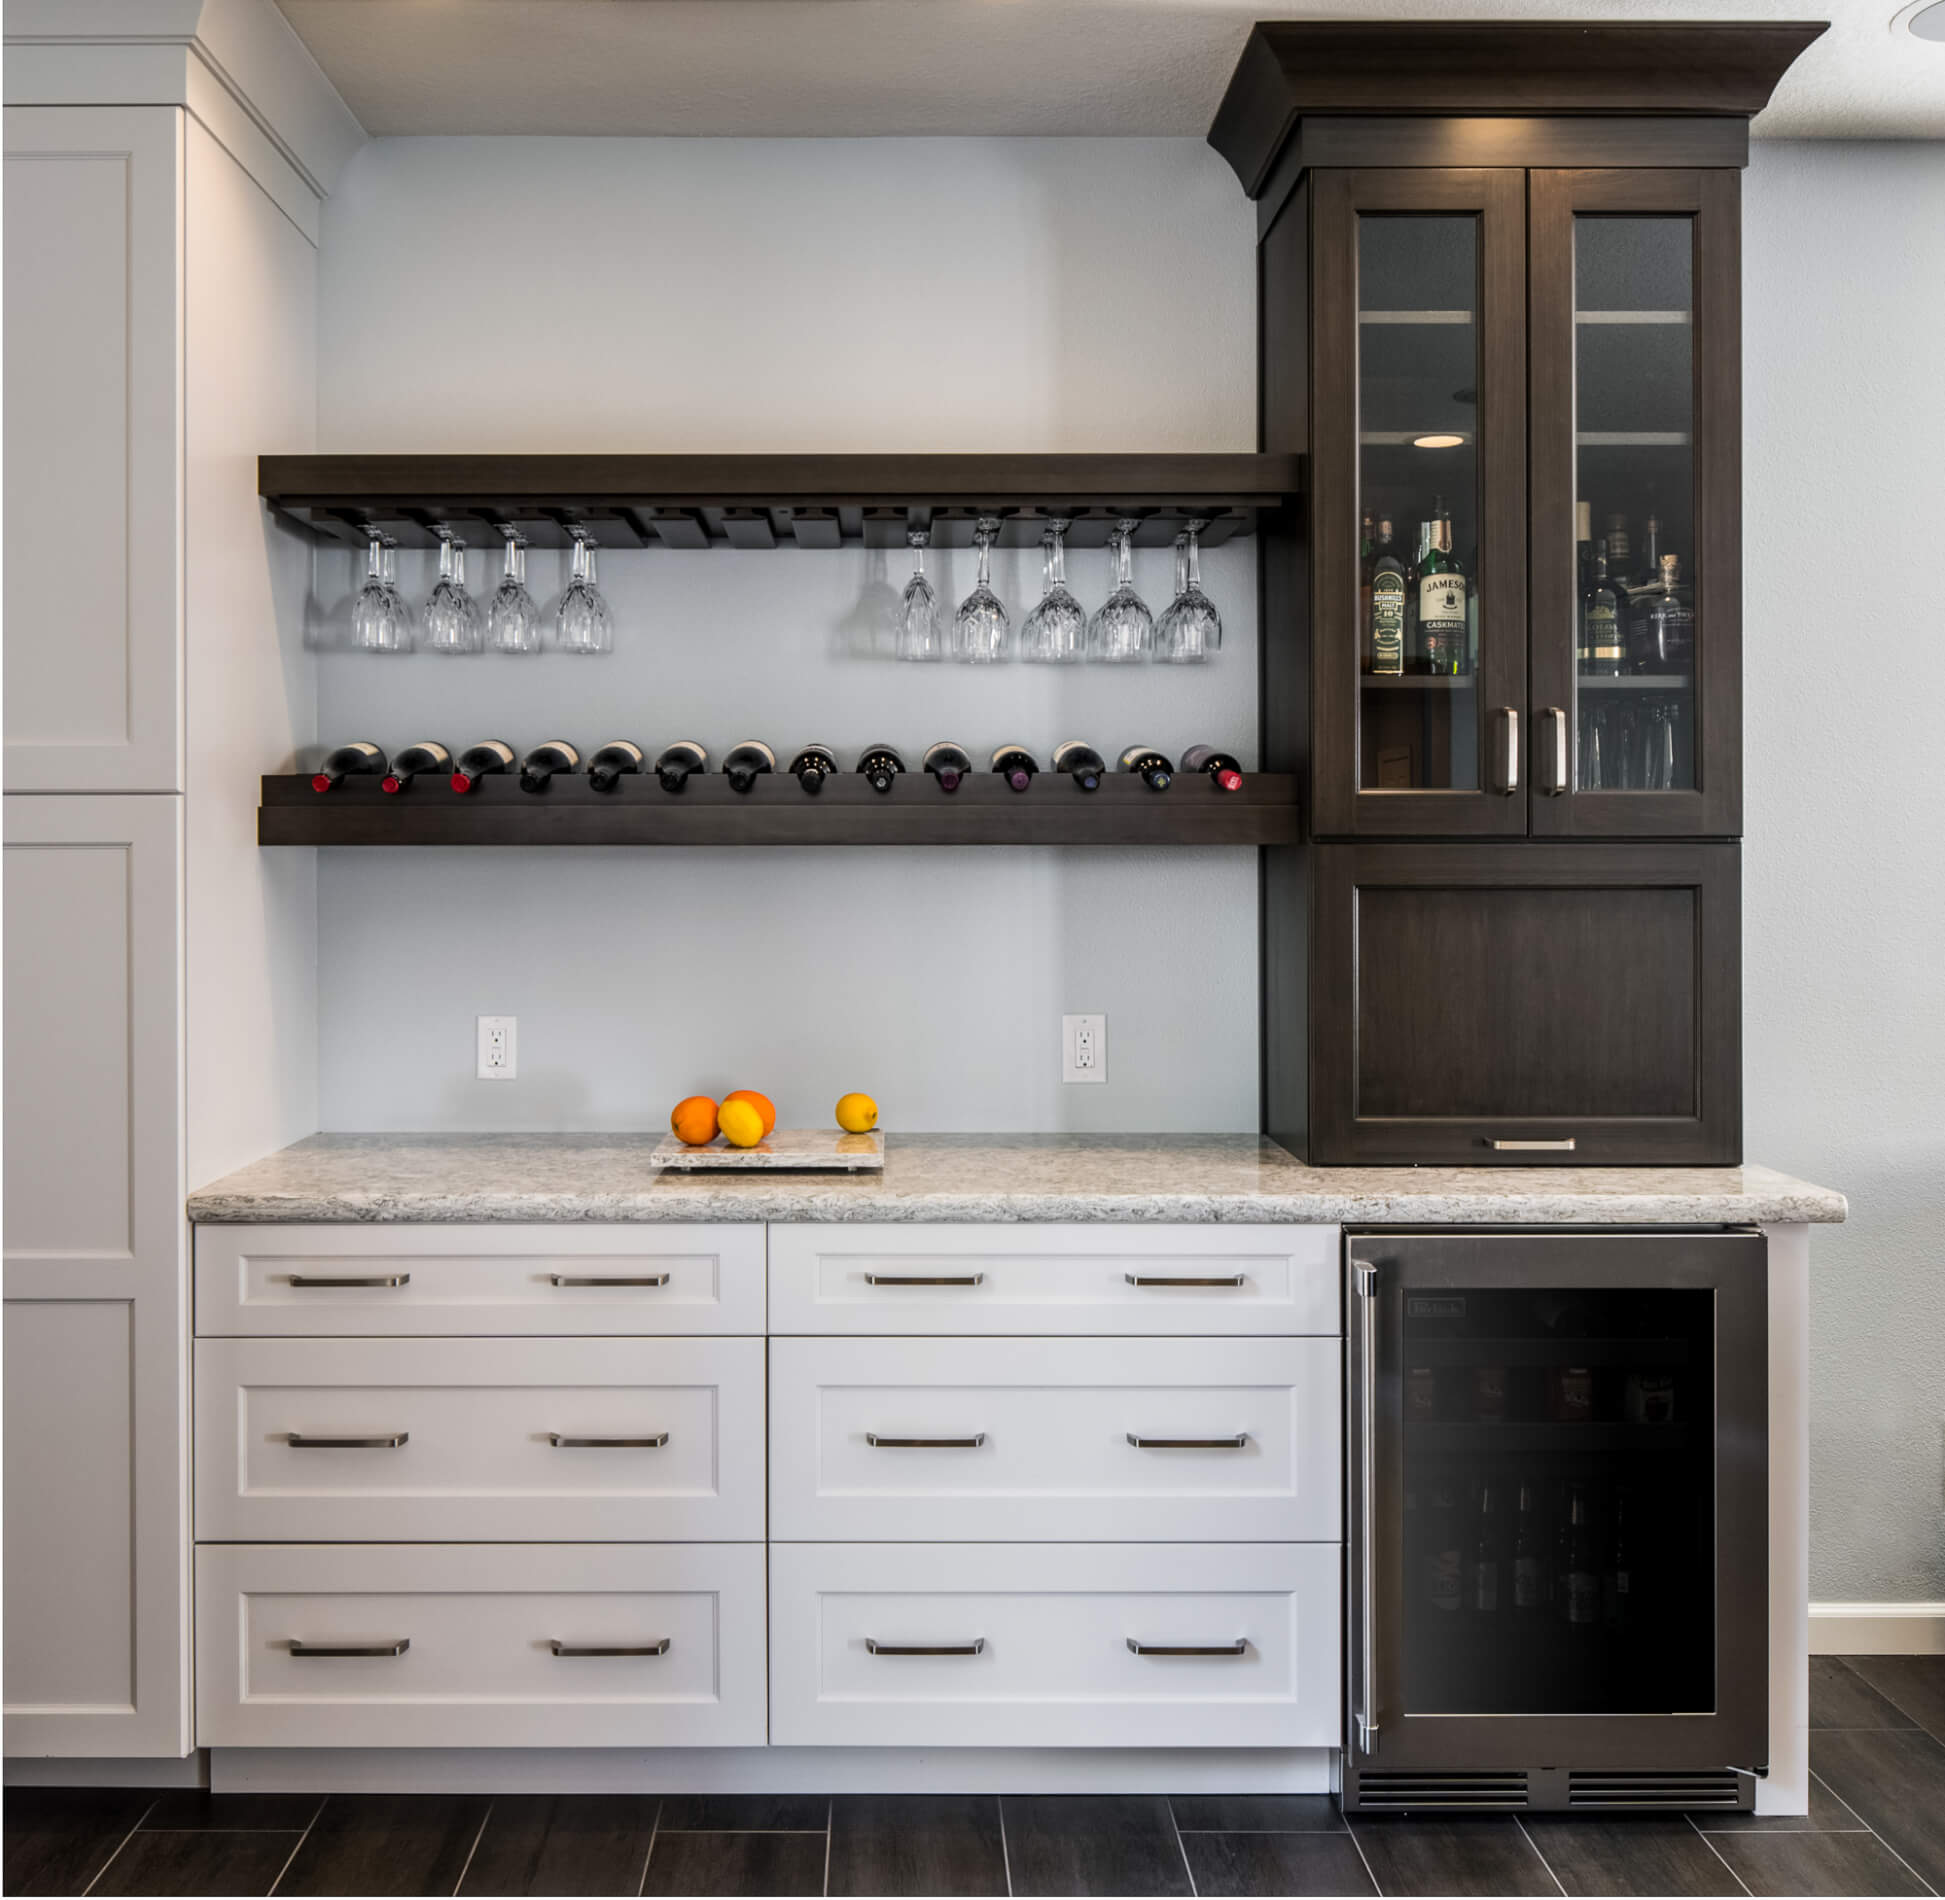 bar area in kitchen with builtin mini fridge winerack and hutch storage